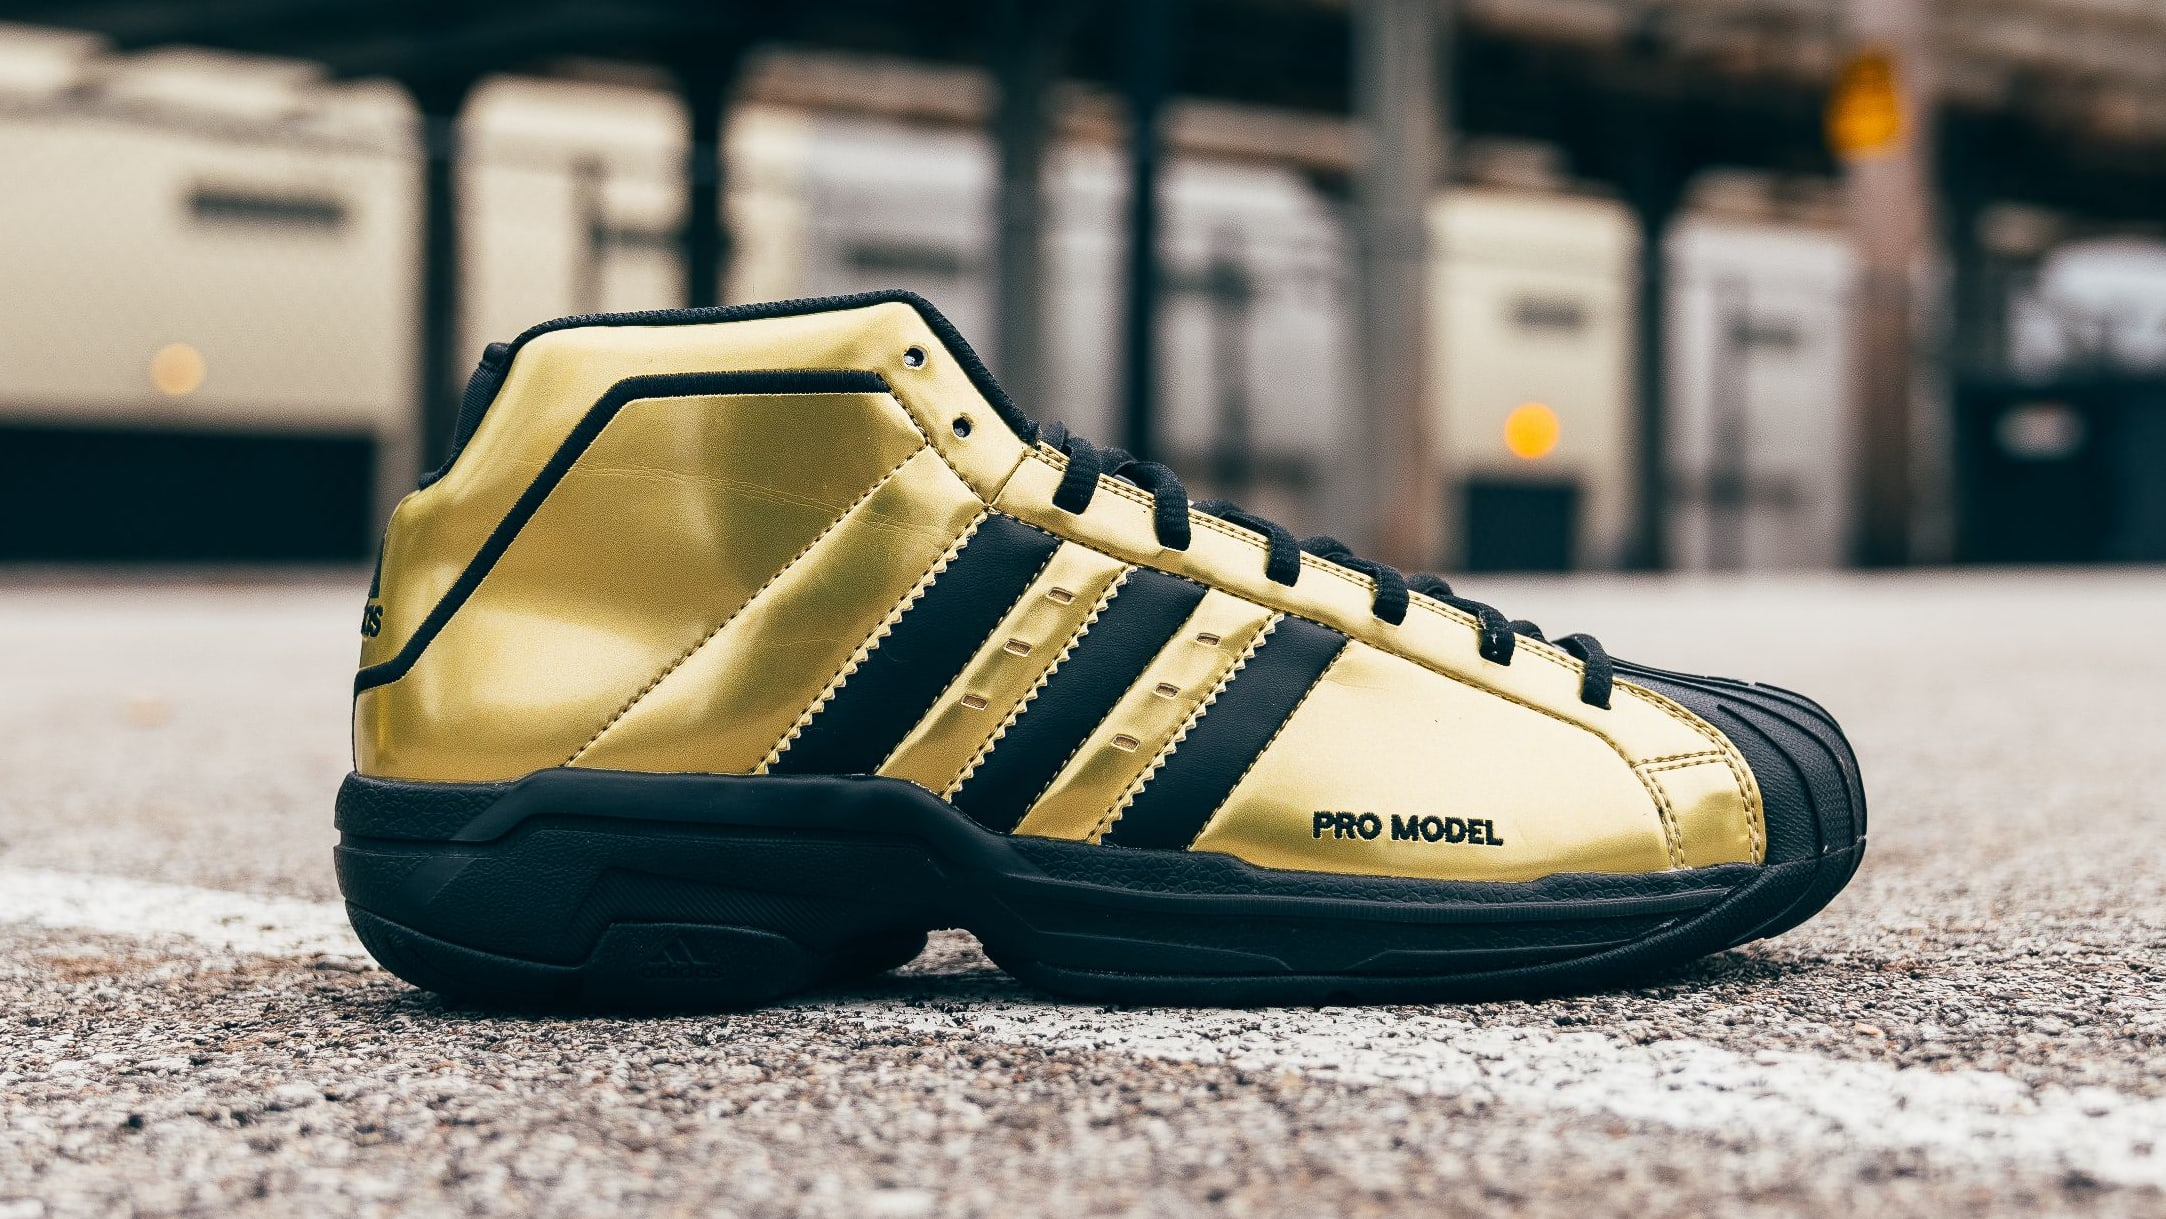 adidas-pro-model-2g-shelltoe